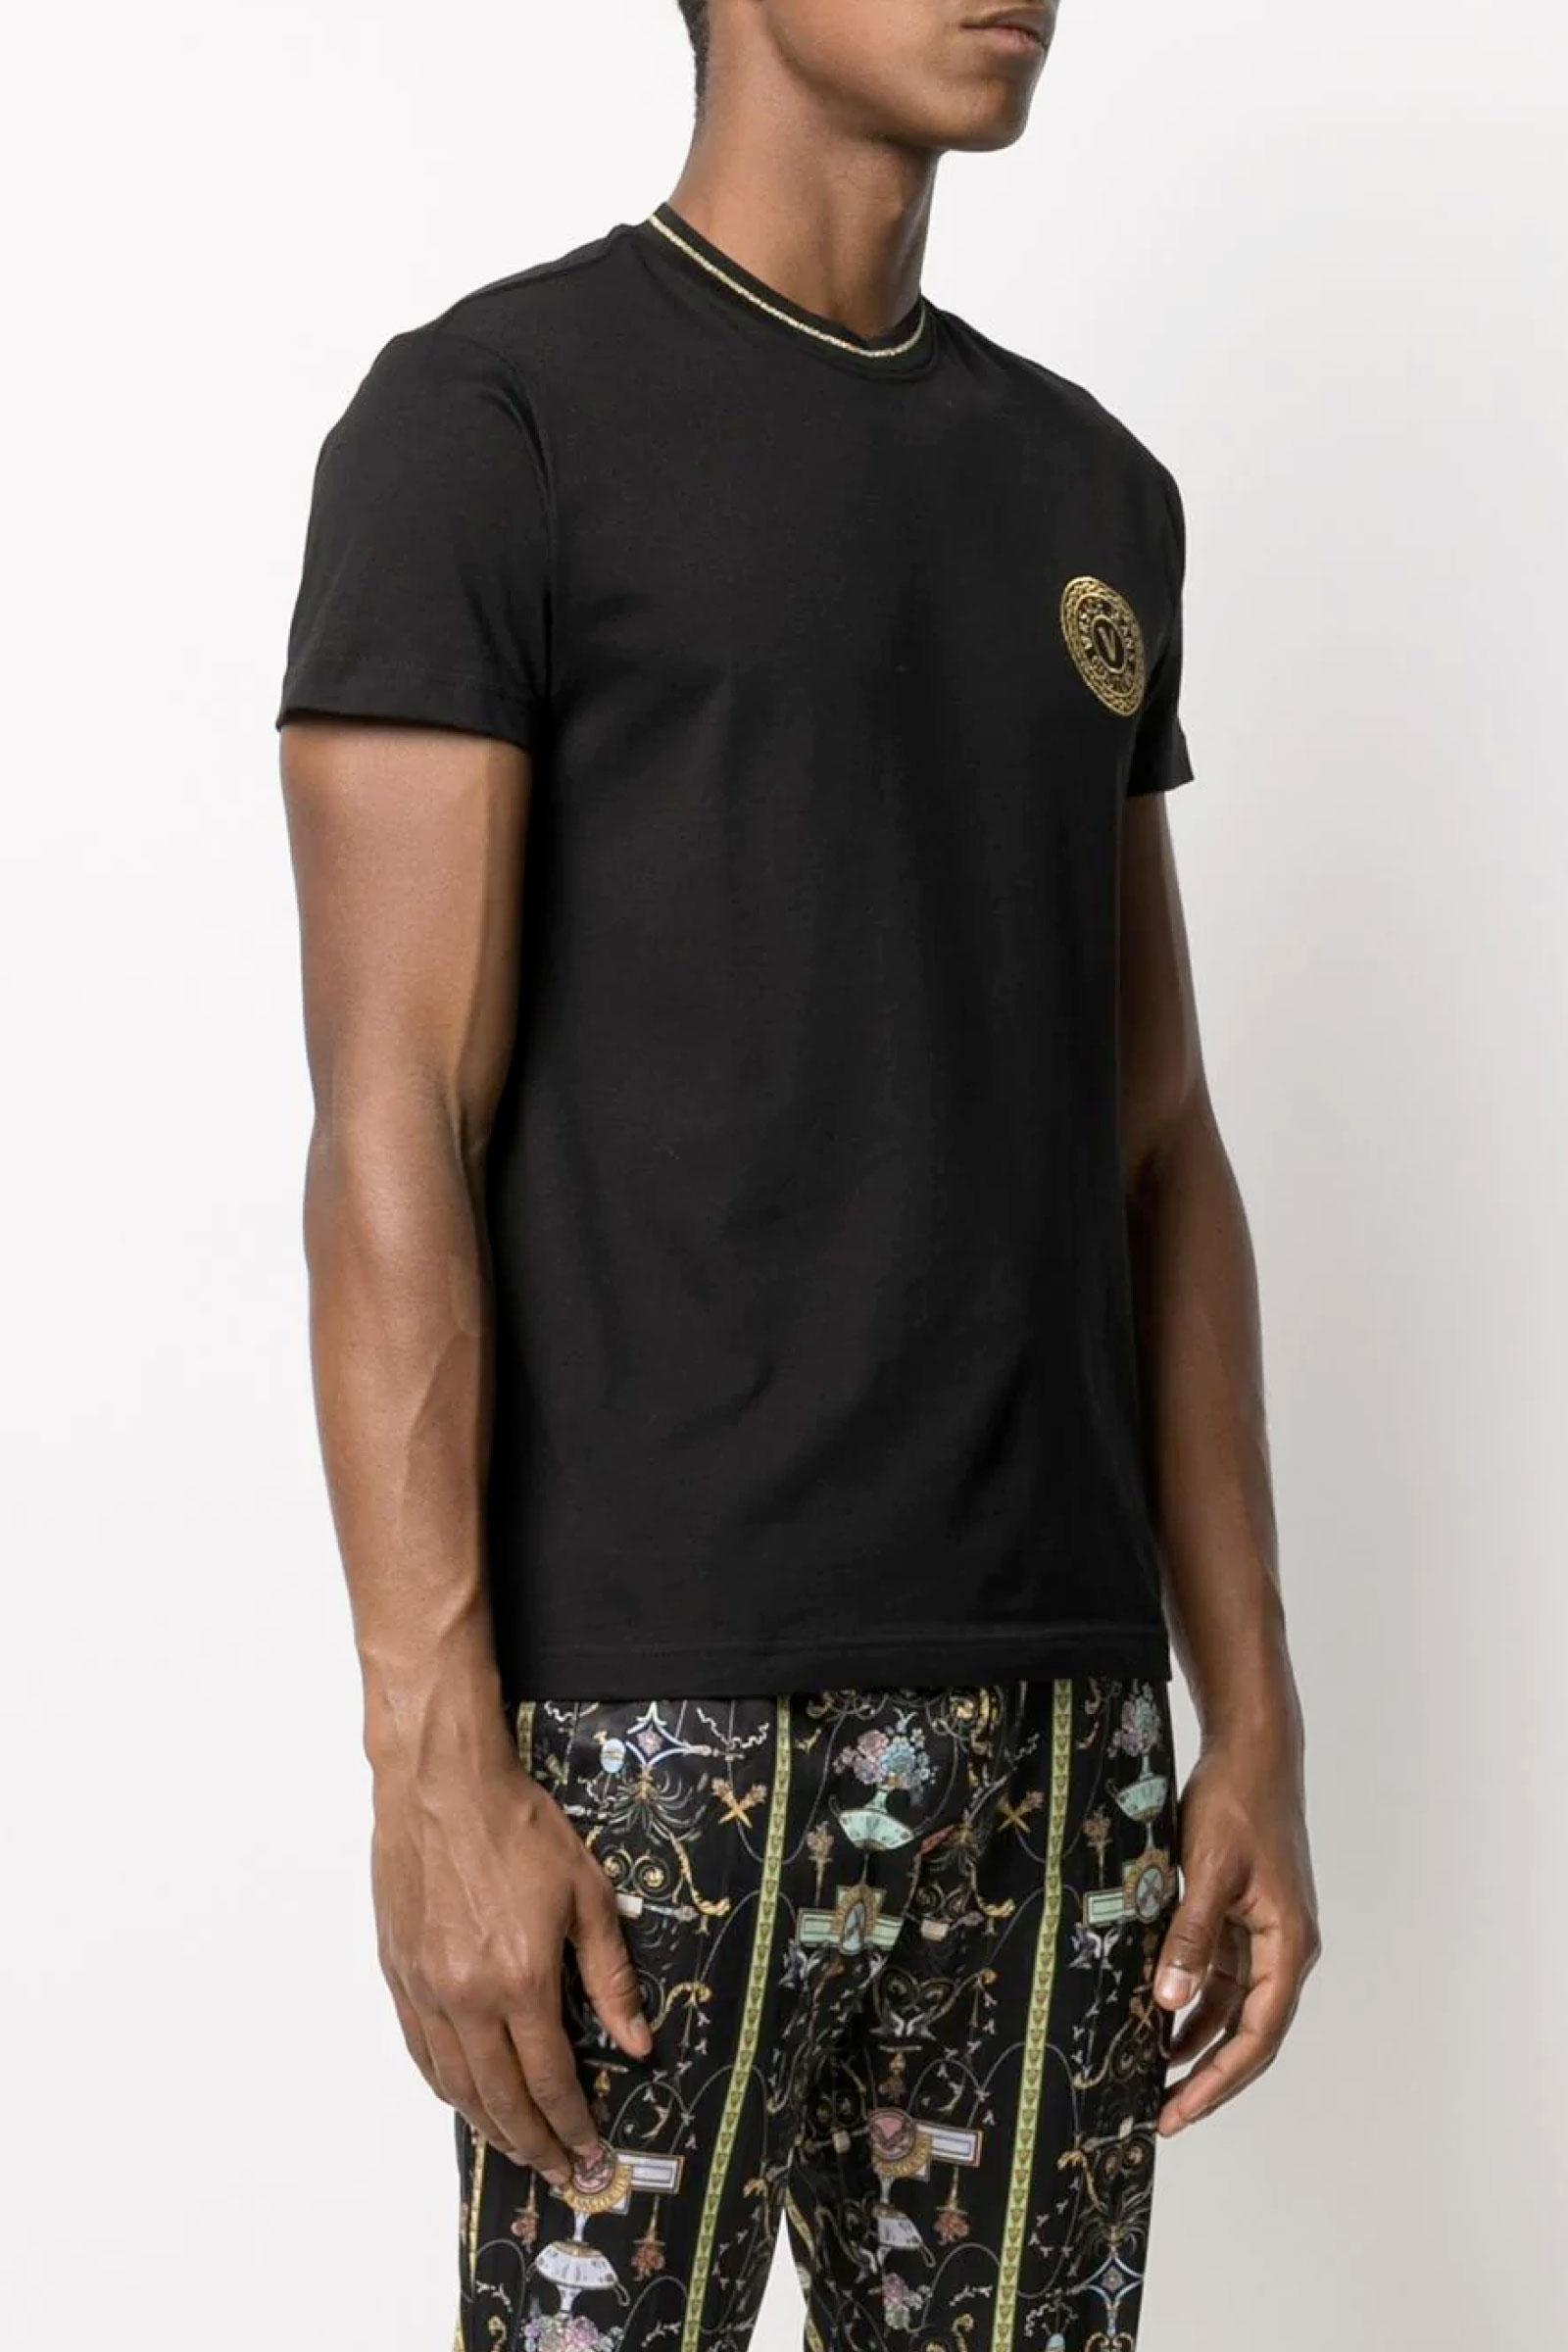 VERSACE JEANS COUTURE Men's T-Shirt VERSACE JEANS COUTURE | T-Shirt | B3GWA7TF30319K42